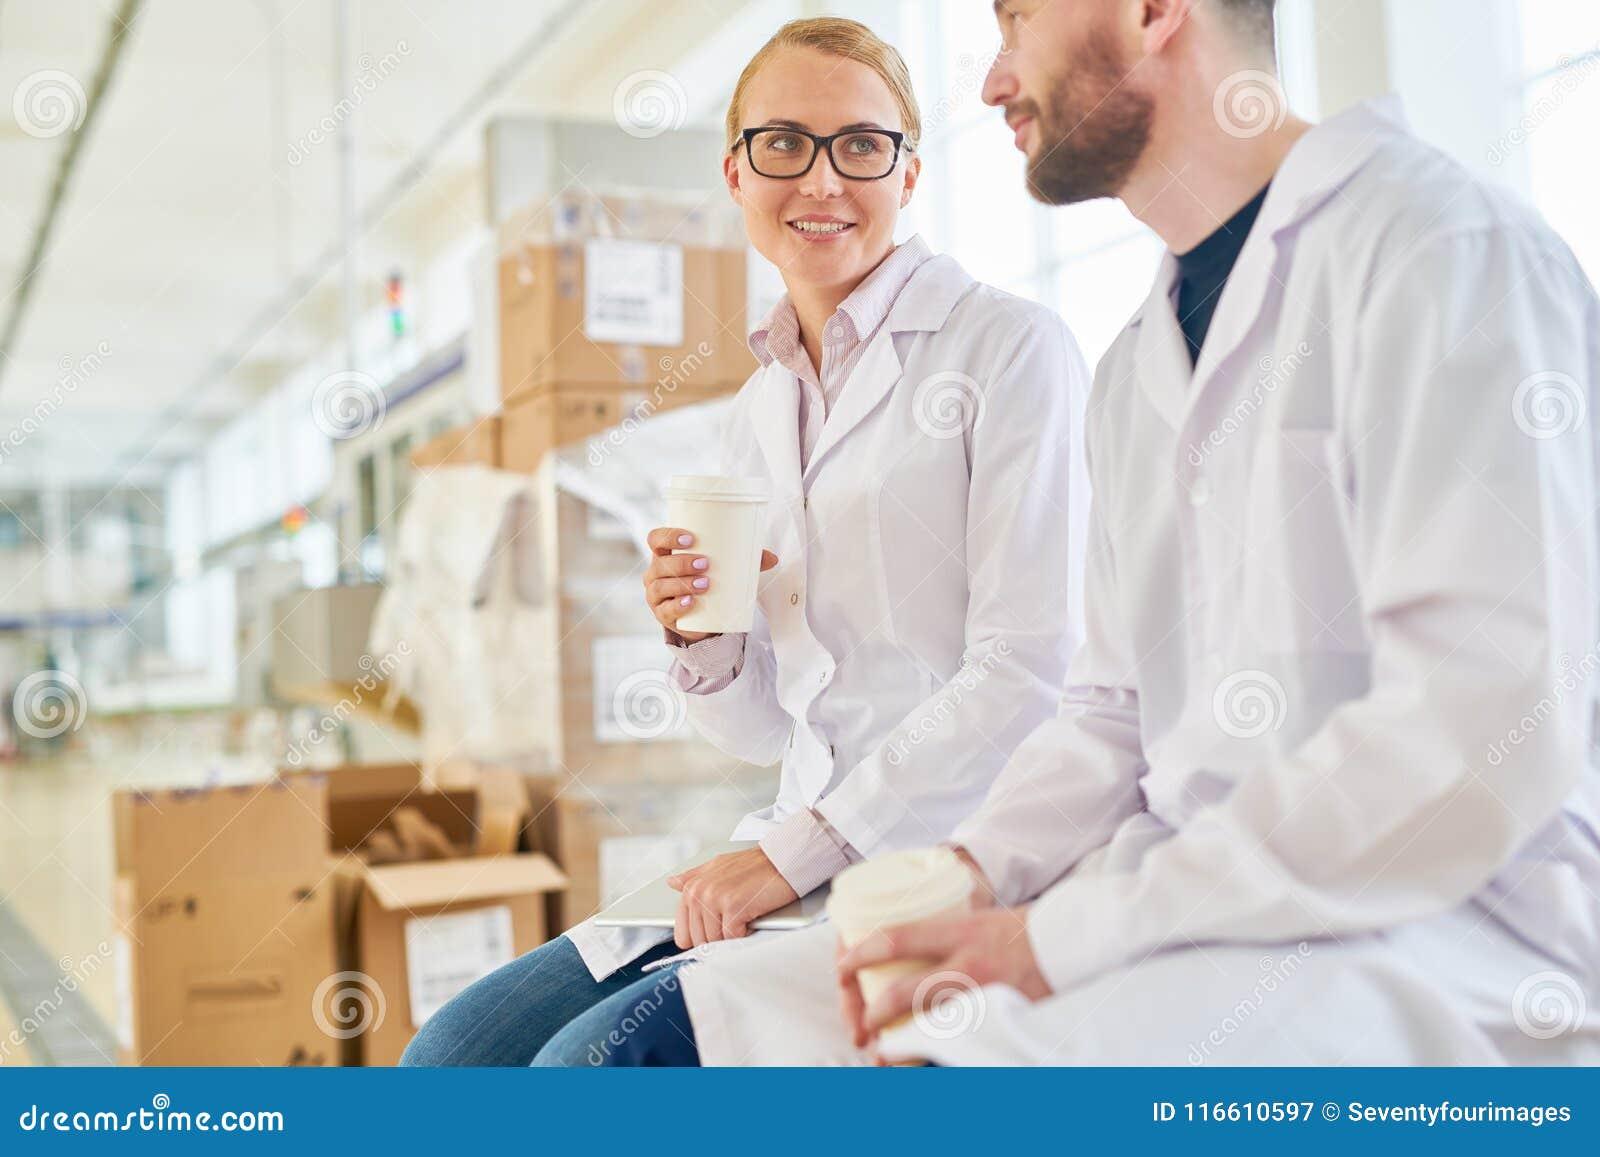 Take Break Coffeebreak : Taking to colleague at coffee break stock image image of milk